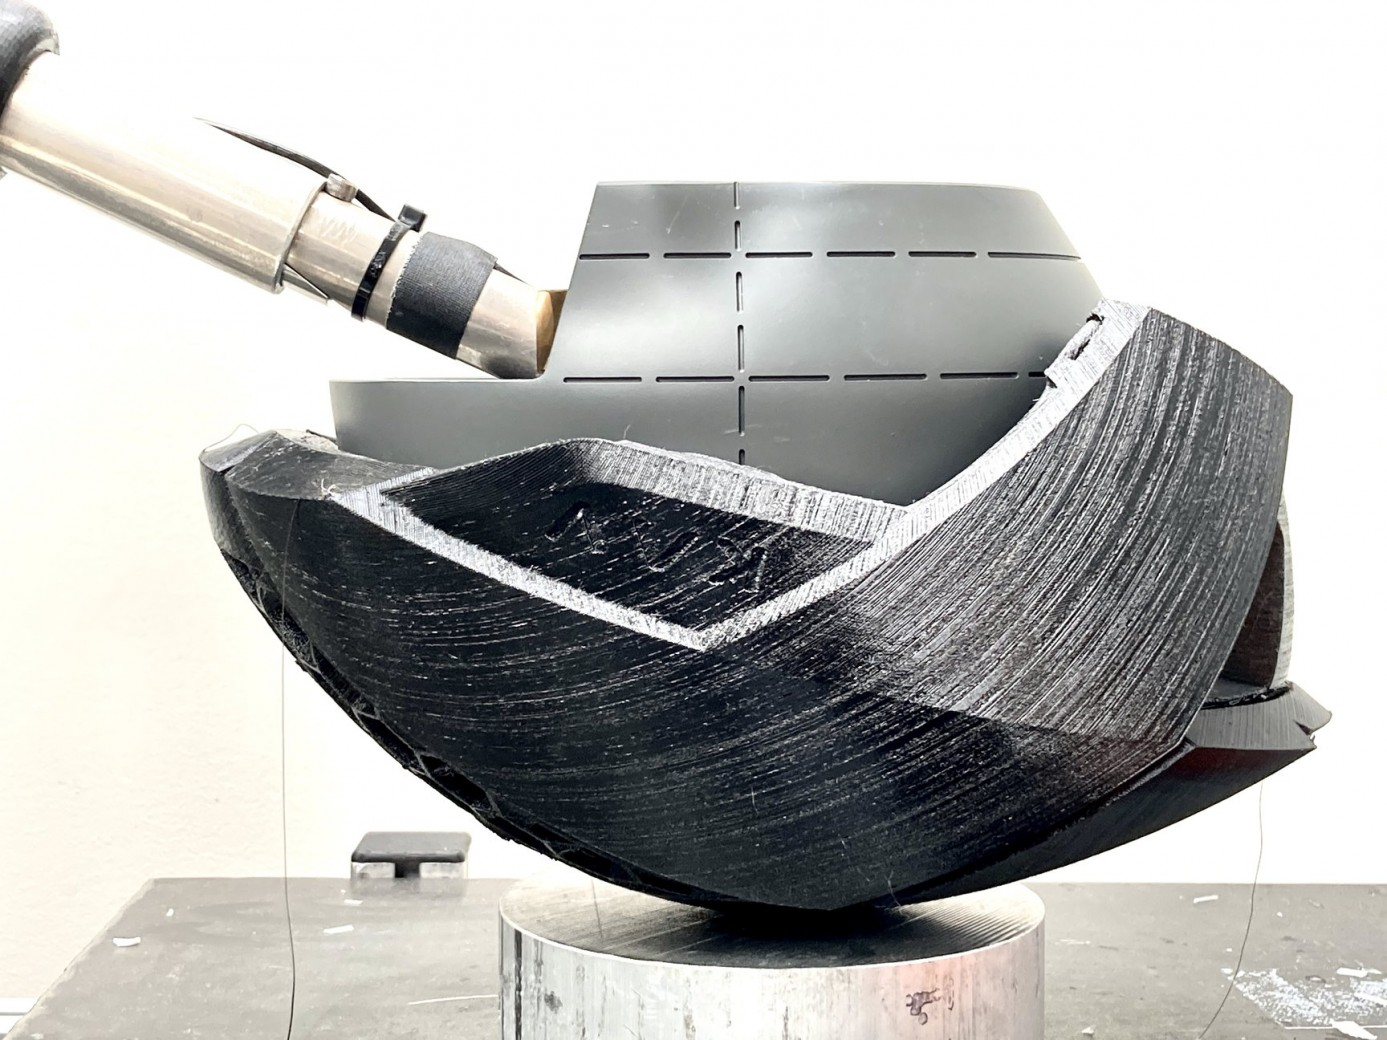 kav-imprimir-cascos-3d/